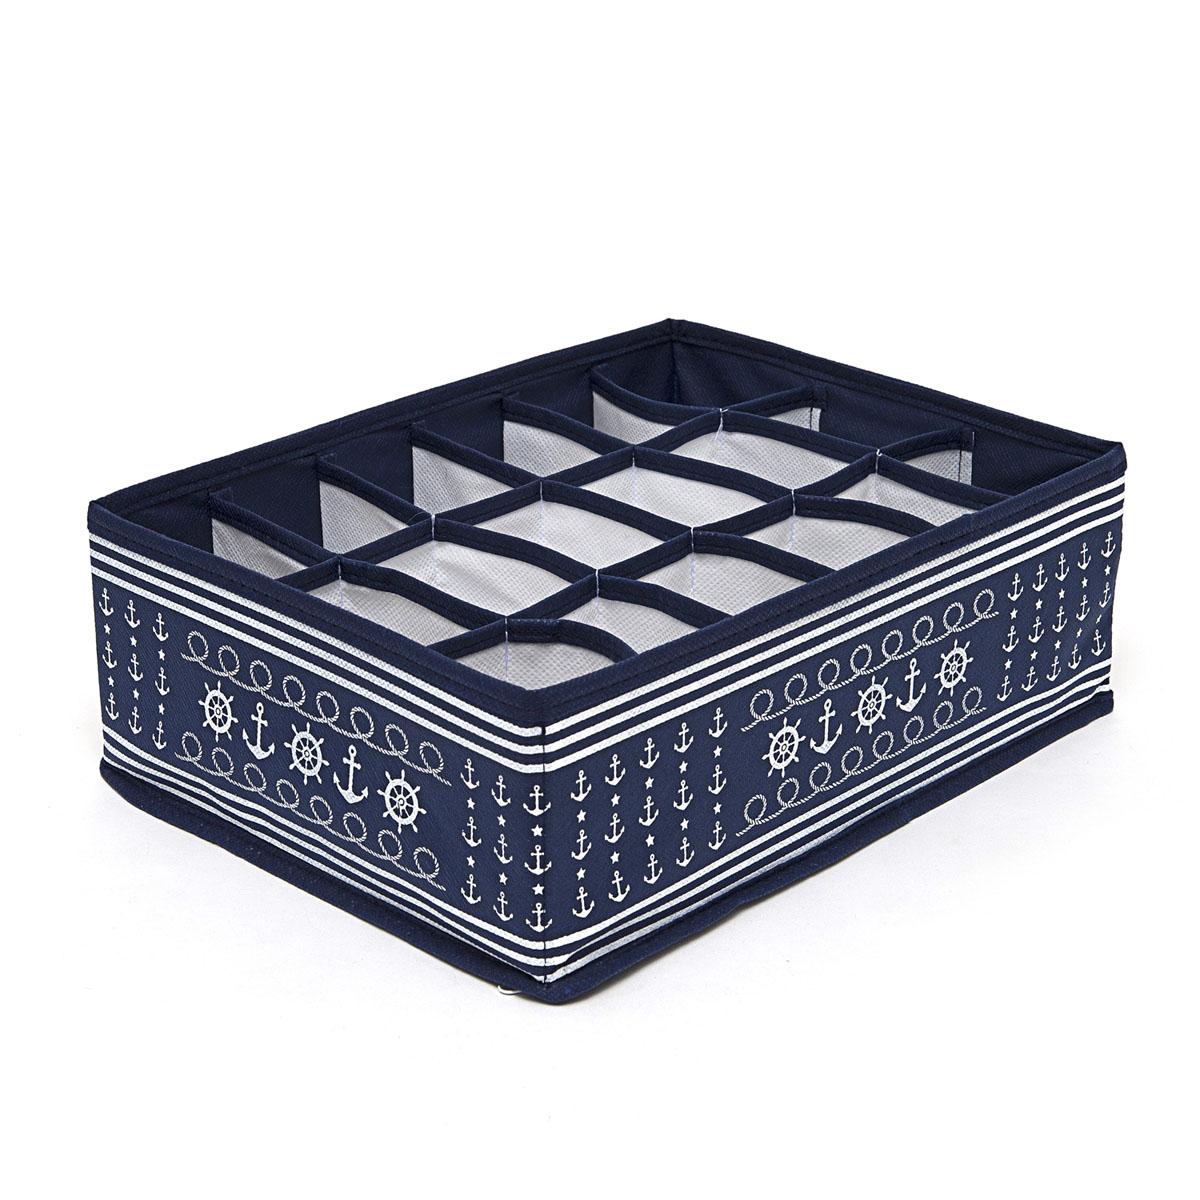 Органайзер для хранения вещей Homsu Ocean, 18 секций, 31 х 24 х 11 см набор органайзеров homsu ностальгия с крышкой 31 х 24 х 11 см 3 шт